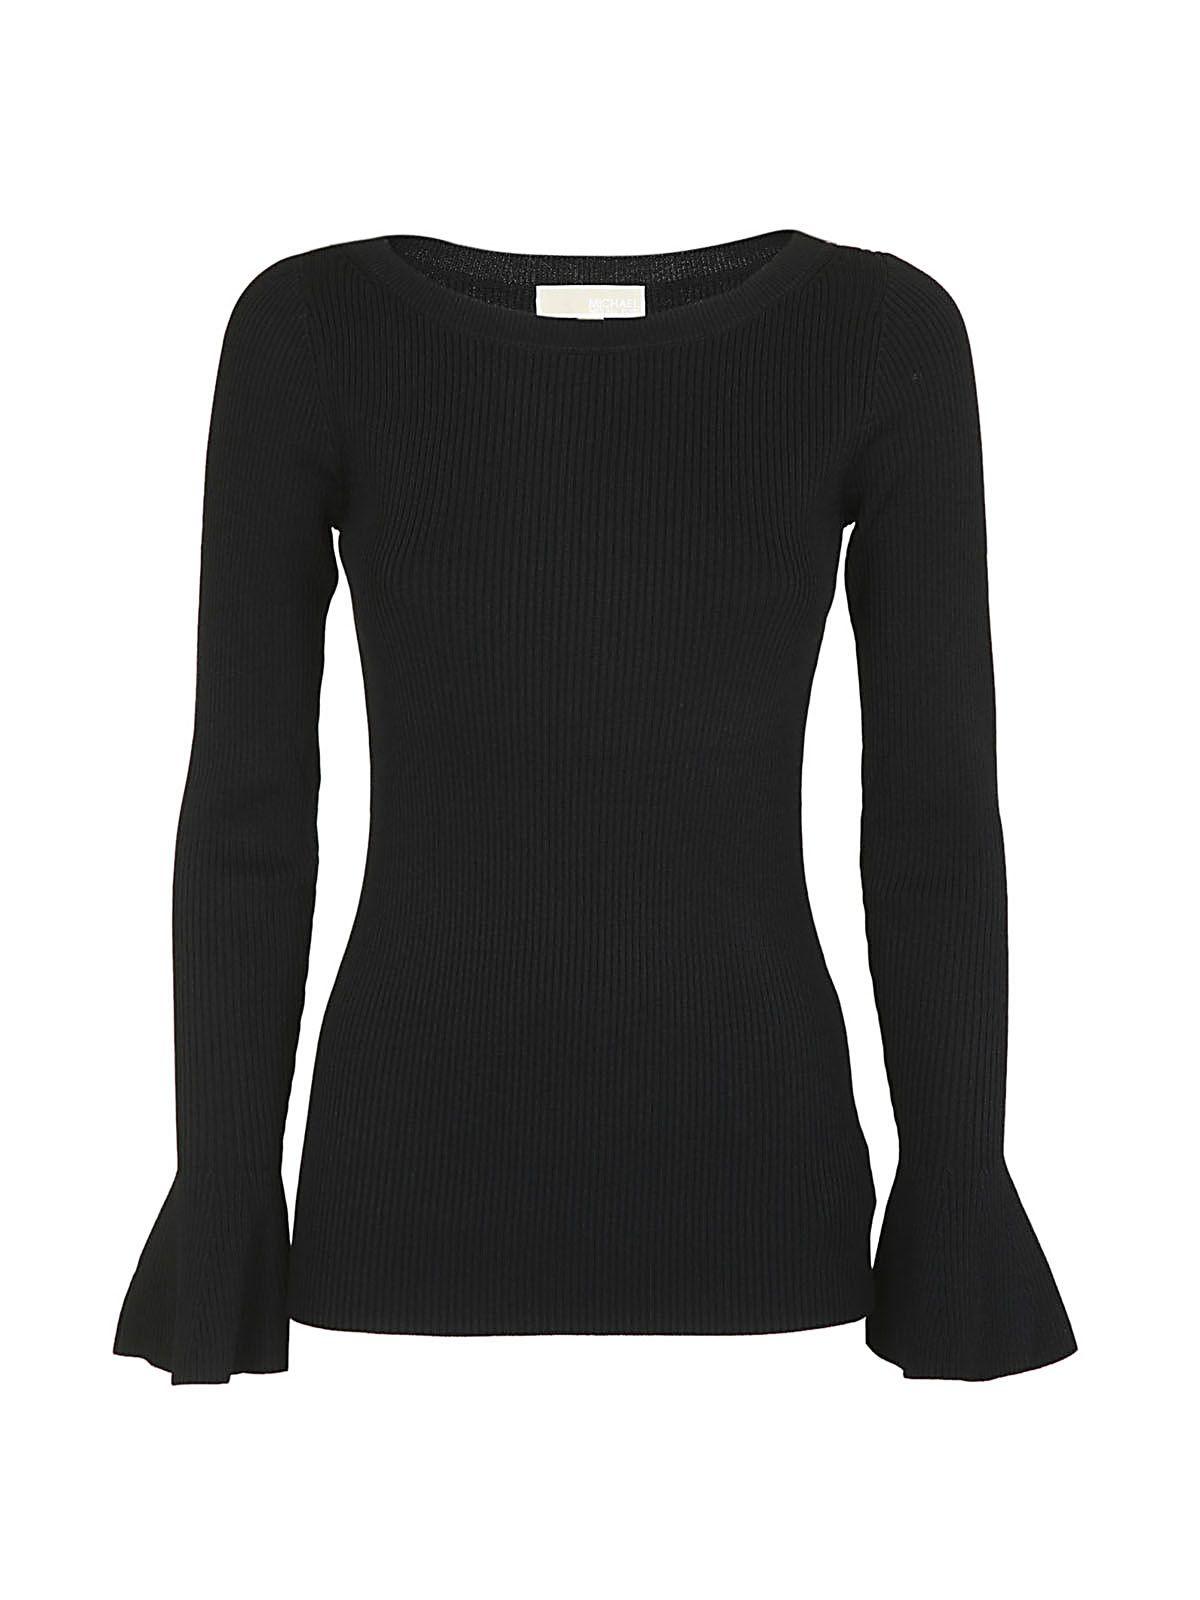 Michael Kors Flared Sweater